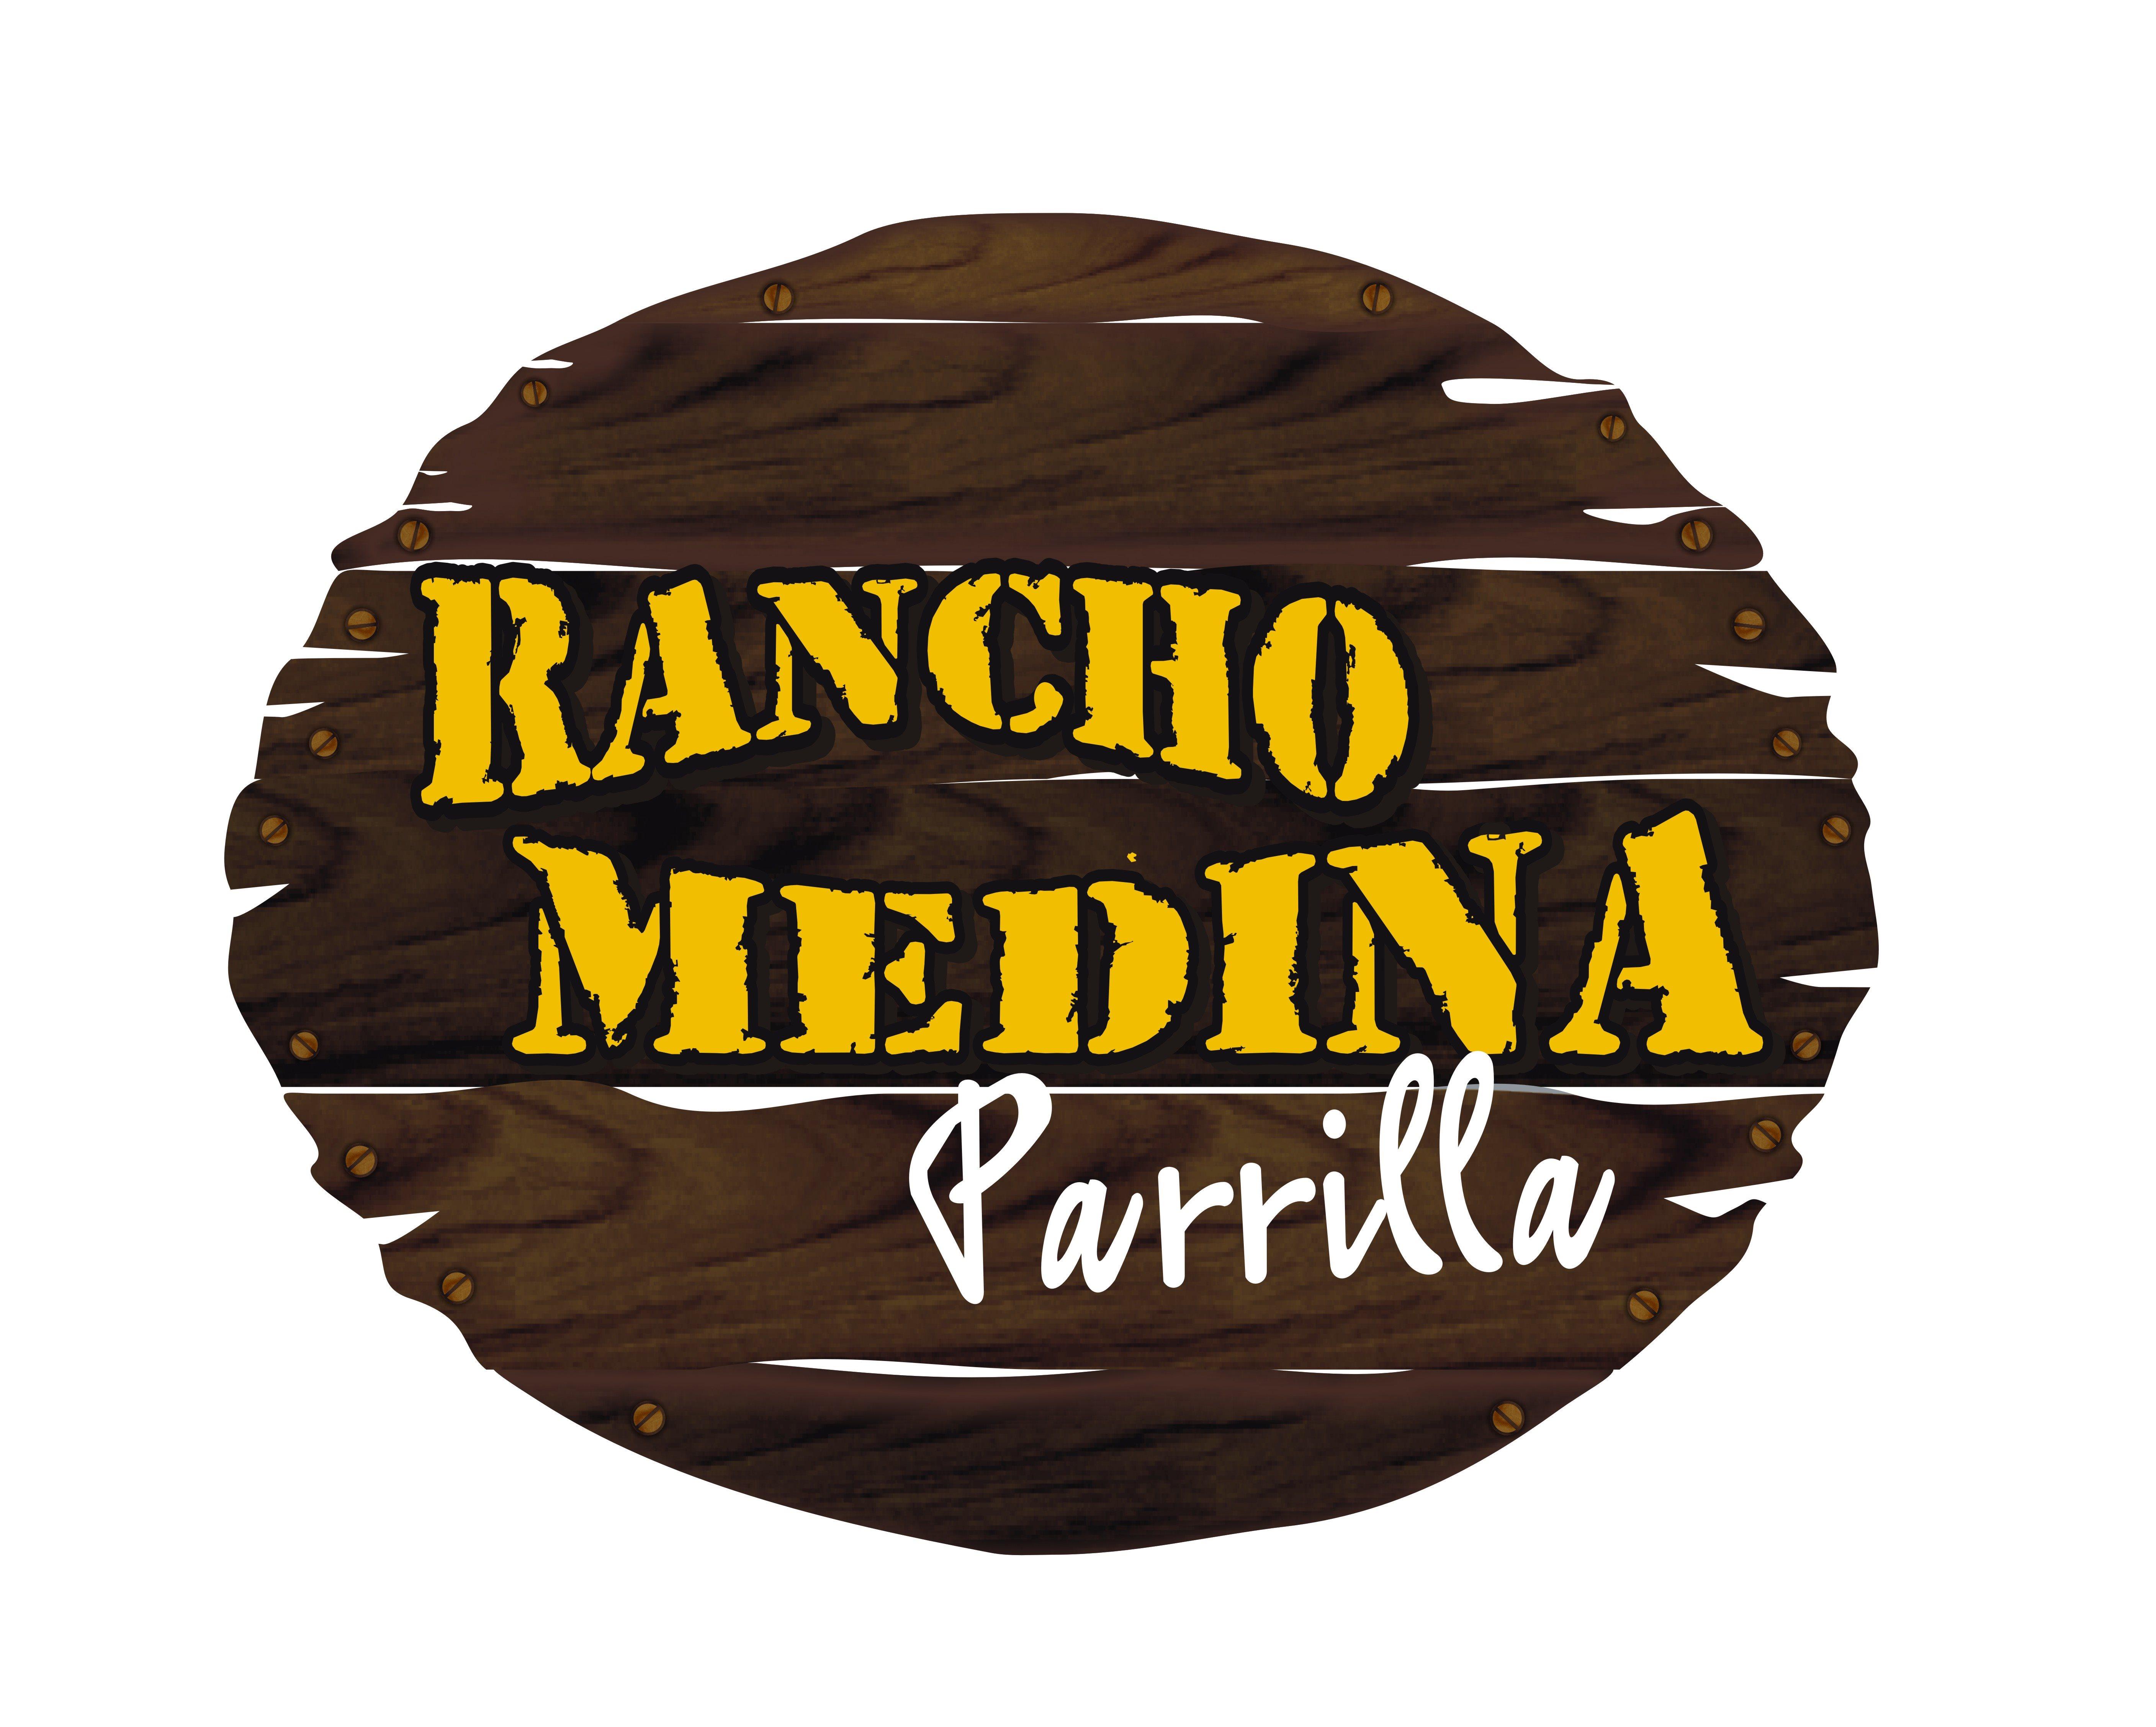 Rancho Medina Parrilla